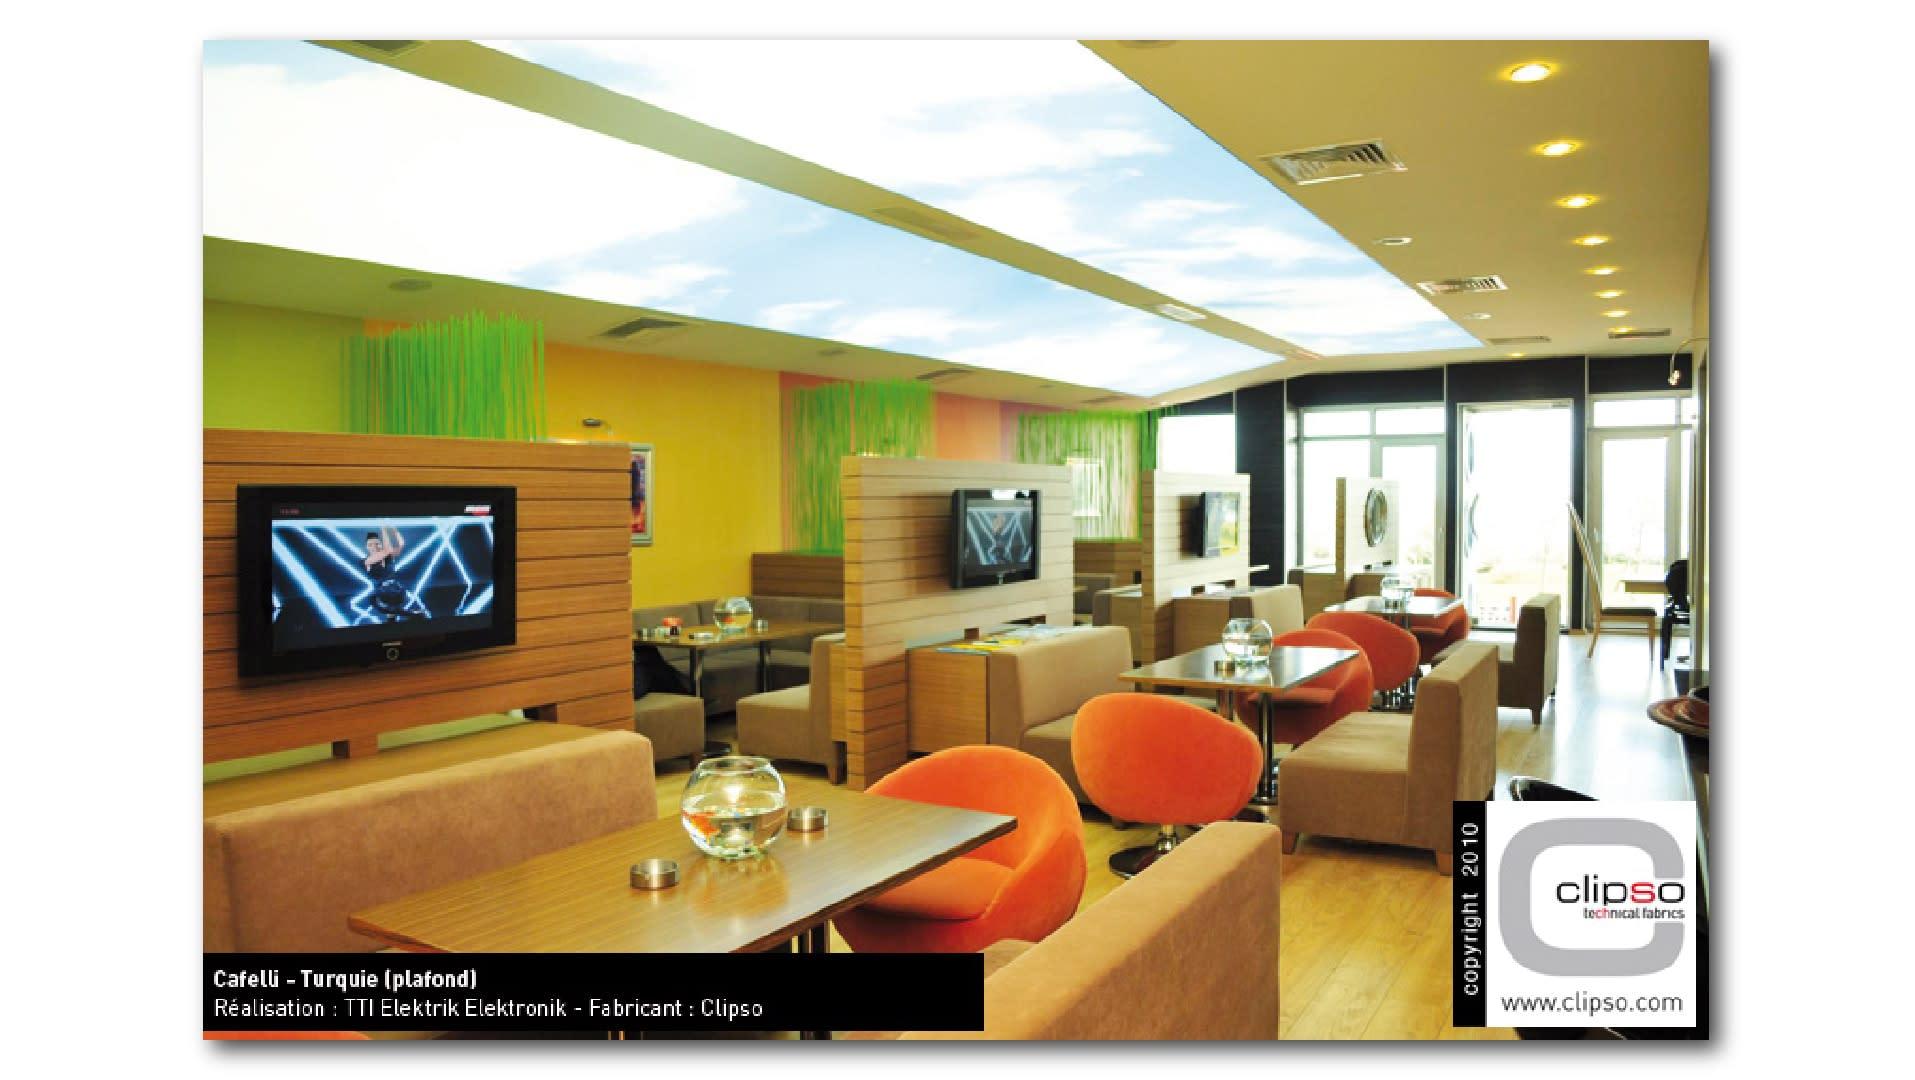 Cafeteria-Lounge-mit-Clipso-Print-an-Wand-und-Decke-01_wtnpfq